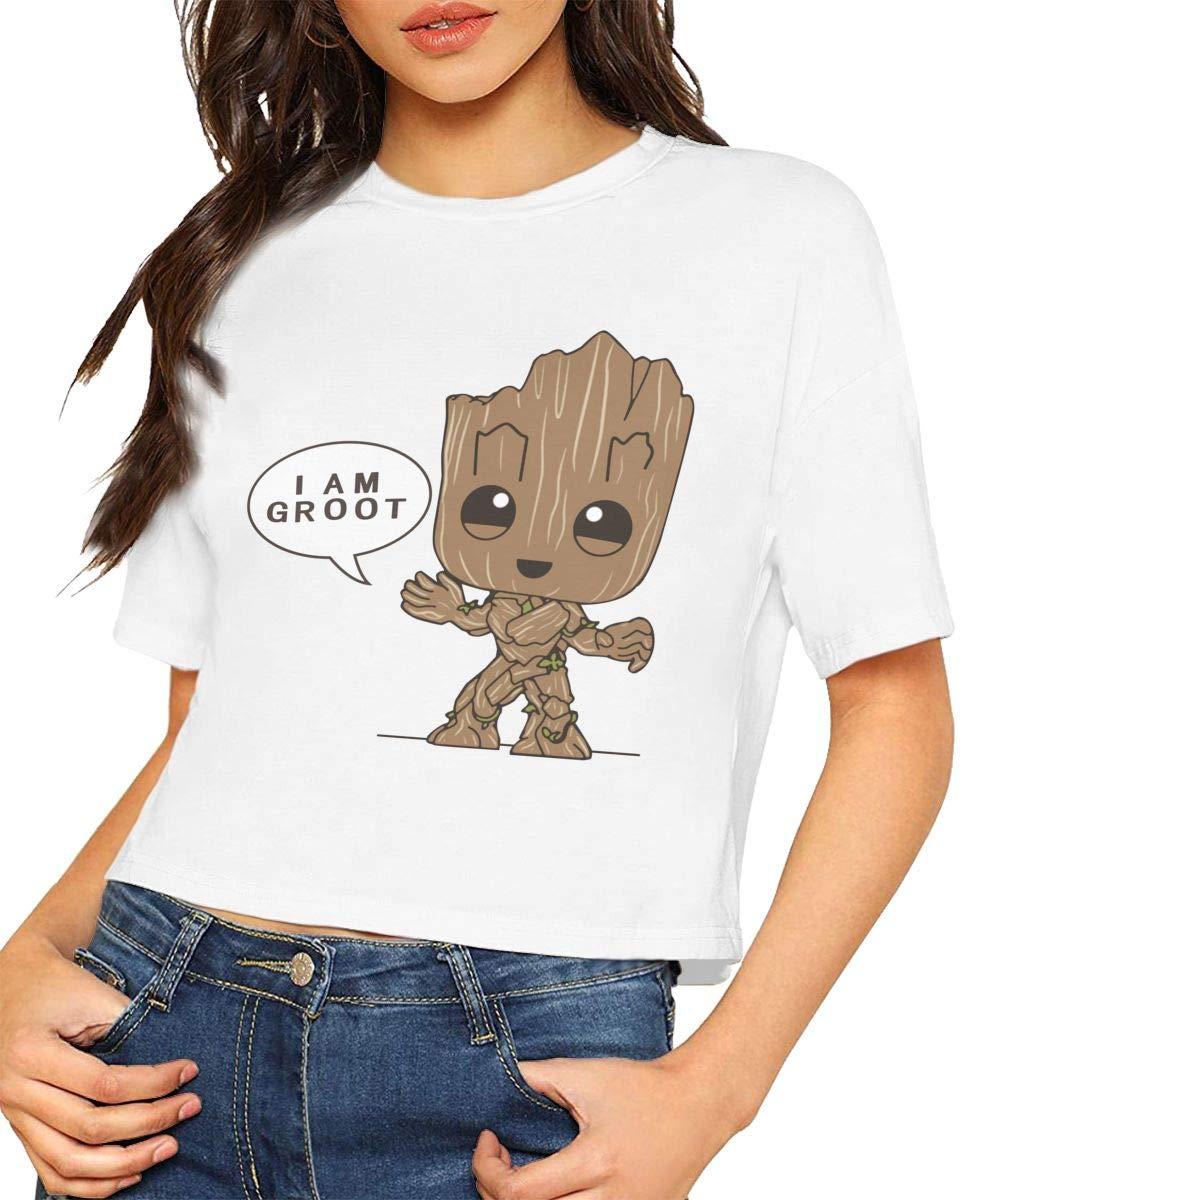 Love Lambert Womens Stylish Short Sleeve T Shirt G-root Printed Crop Top Soft